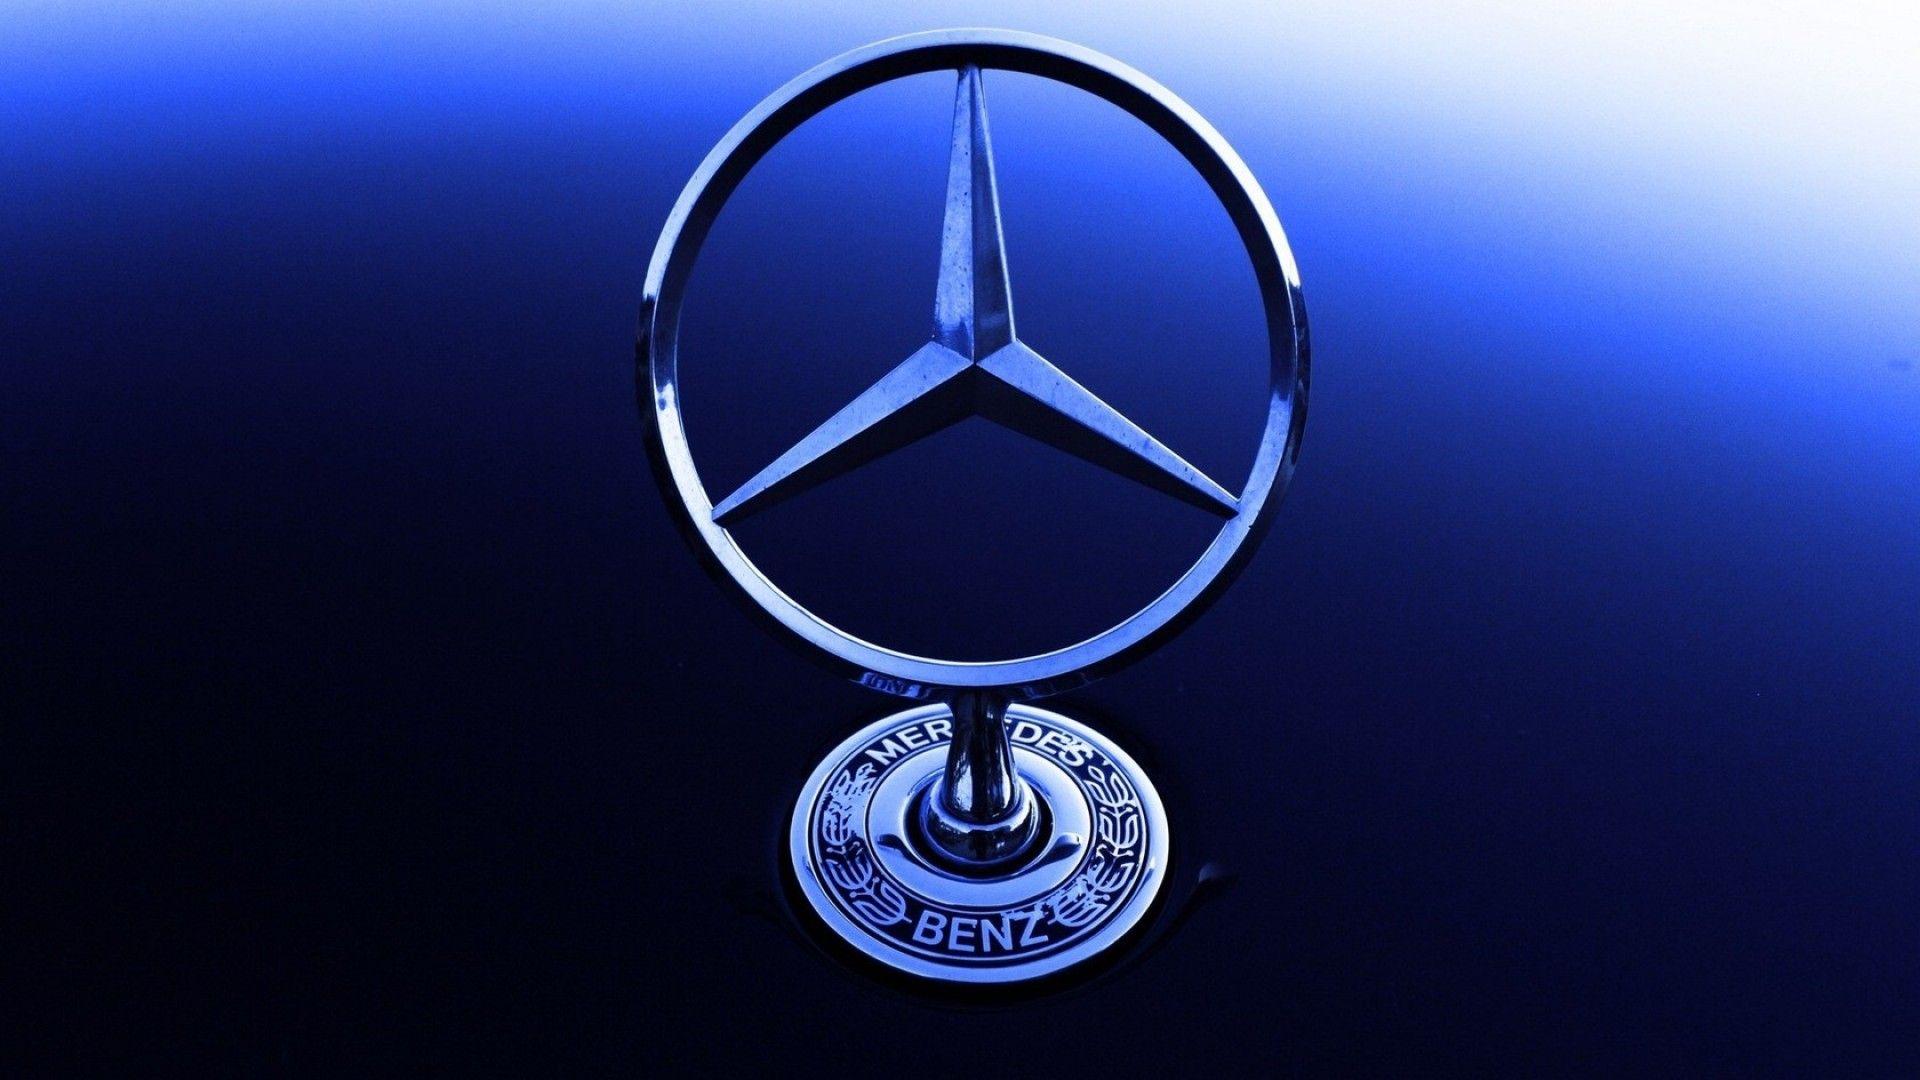 Pin By Flash Boy On Mercedes Logos Mercedes Logo Mercedes Benz